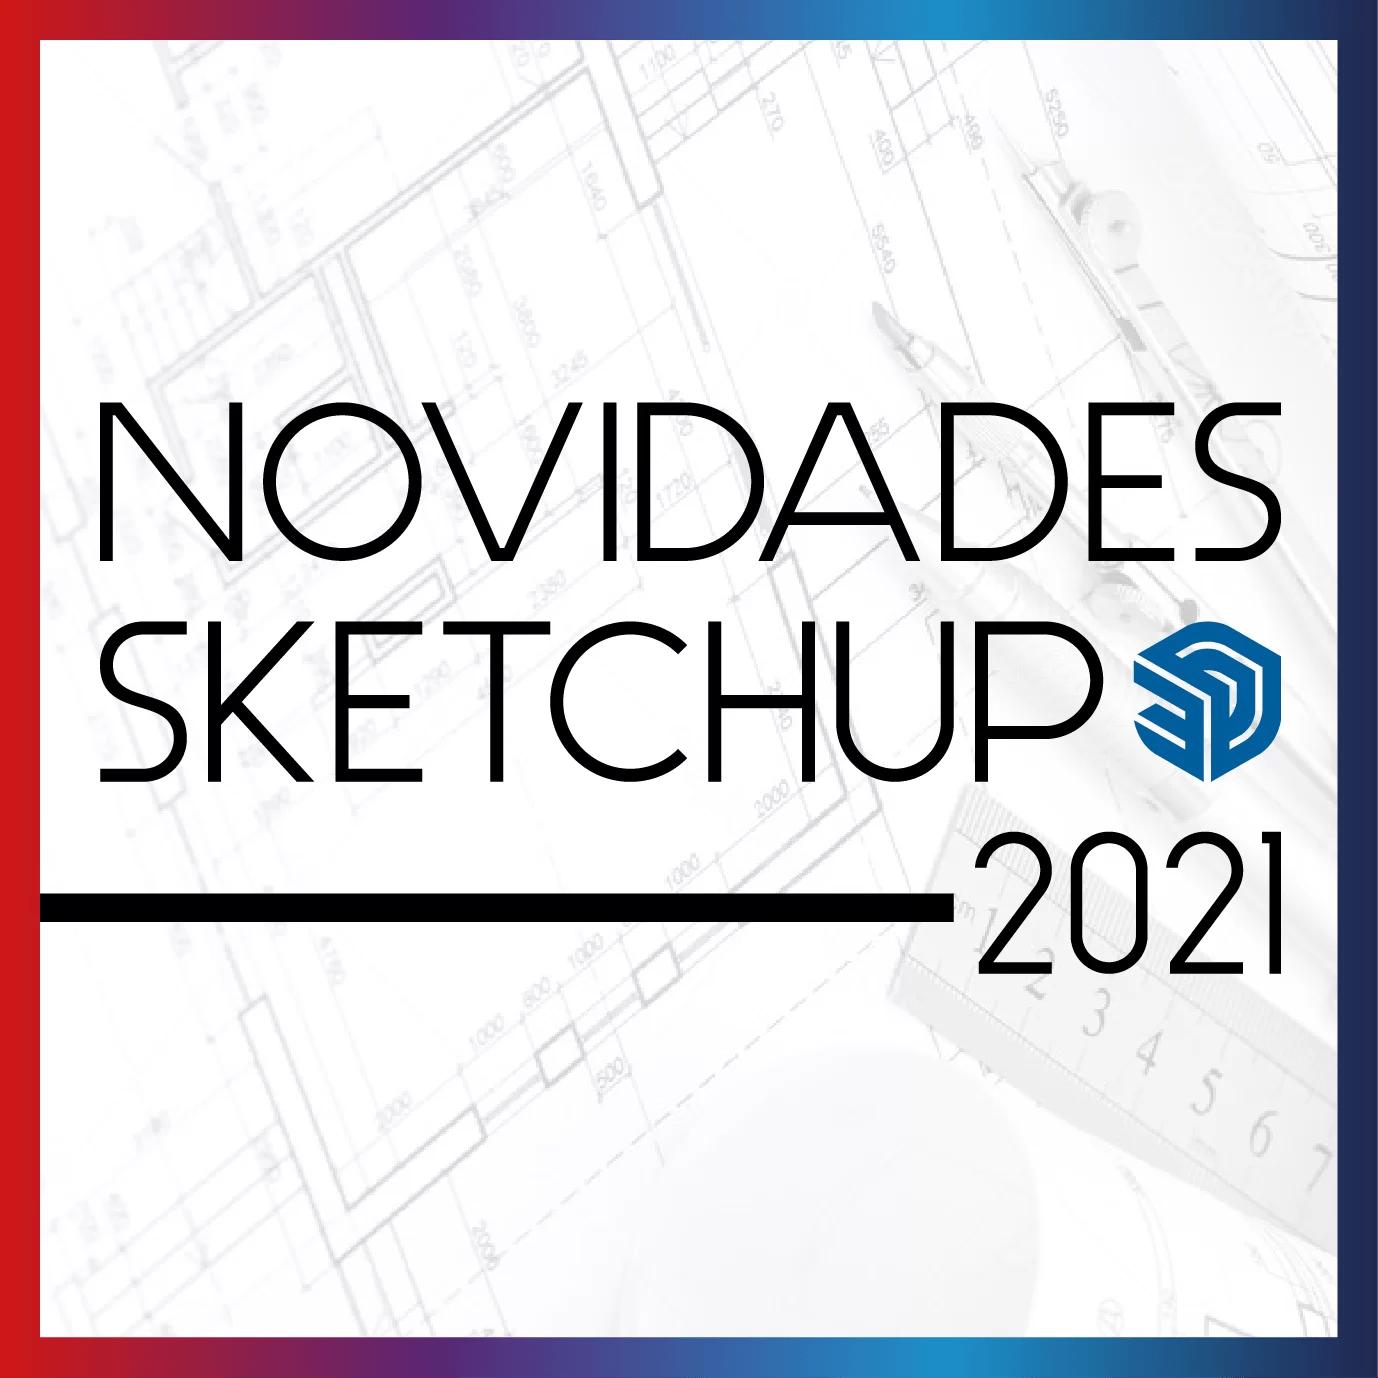 SketchUp Novidades